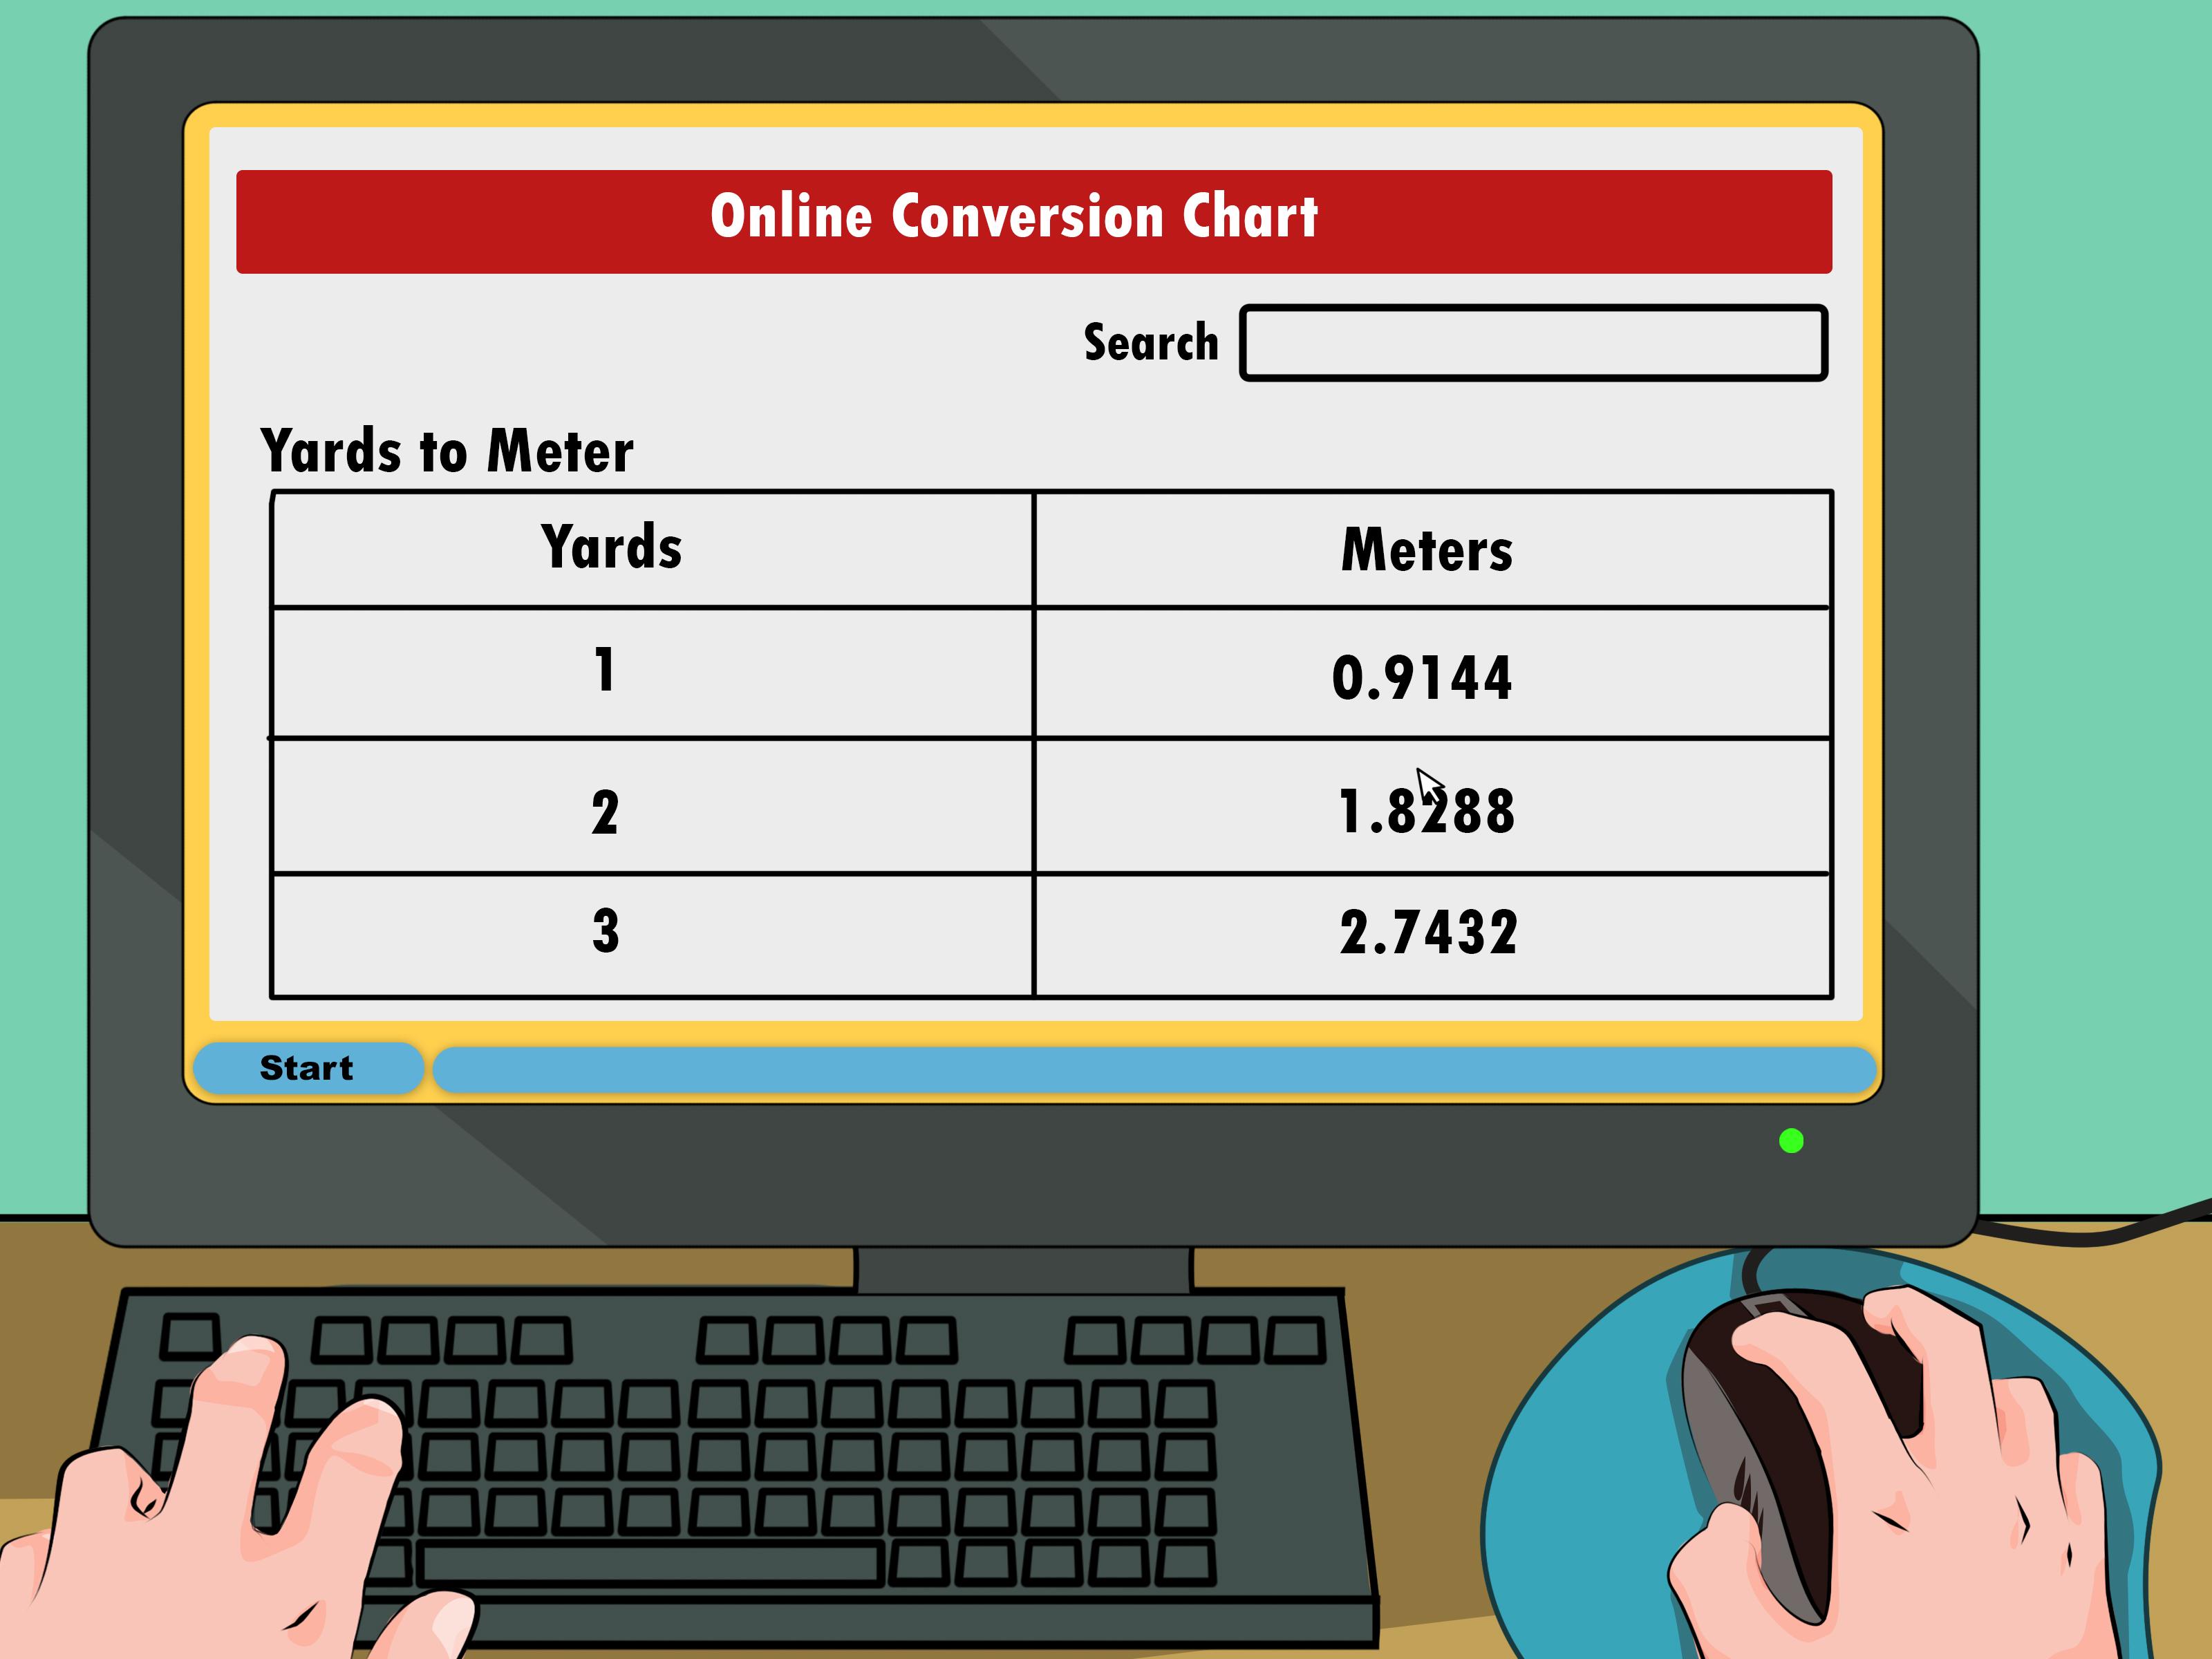 4 Ways To Convert Yards To Meters